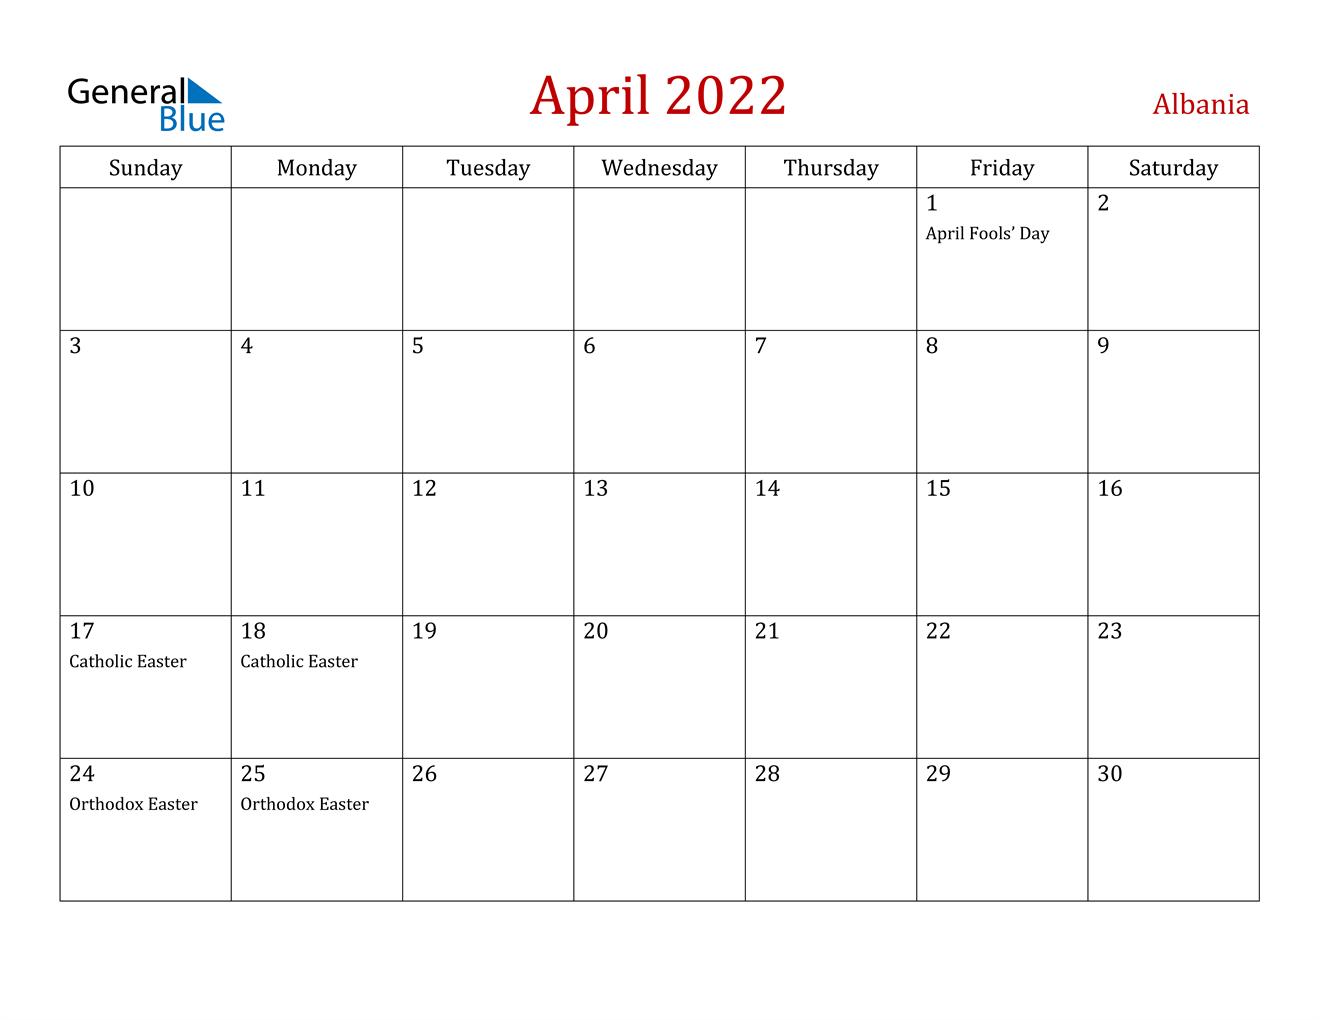 Download april 2022 calendar as html, excel xlsx, word docx, pdf or picture. April 2022 Calendar - Albania